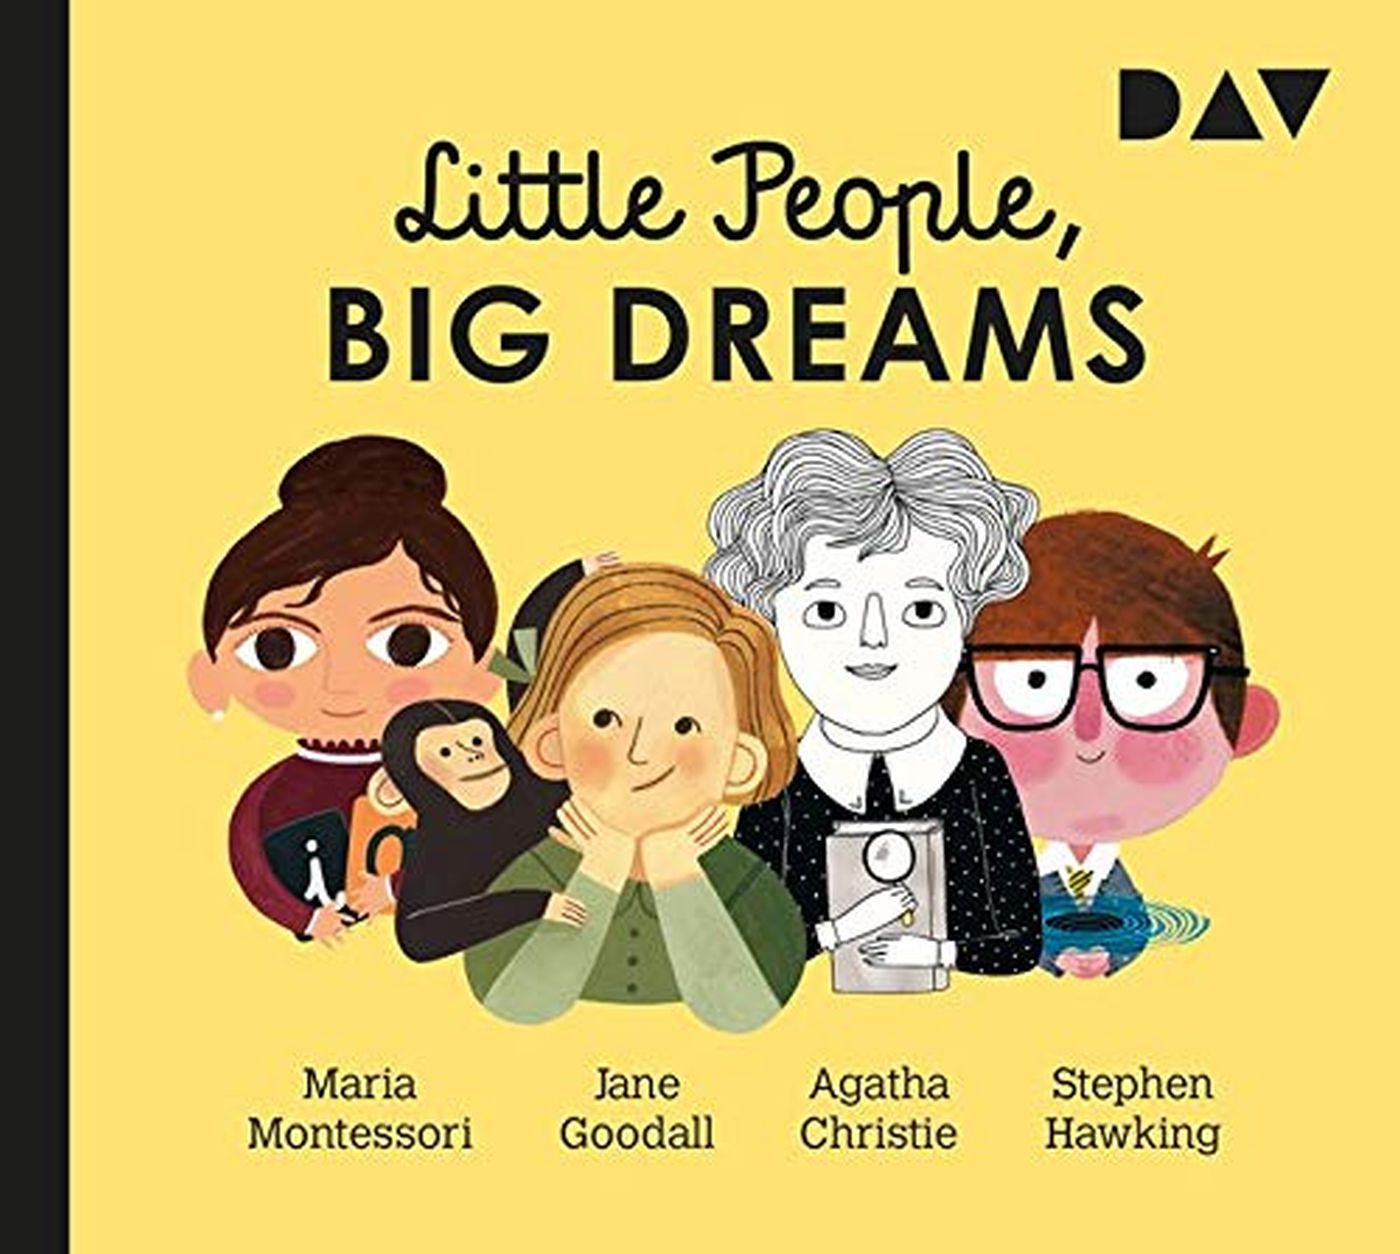 Little People, Big Dreams – Teil 1: Maria Montessori, Jane Goodall, Agatha Christie, Stephen Hawking